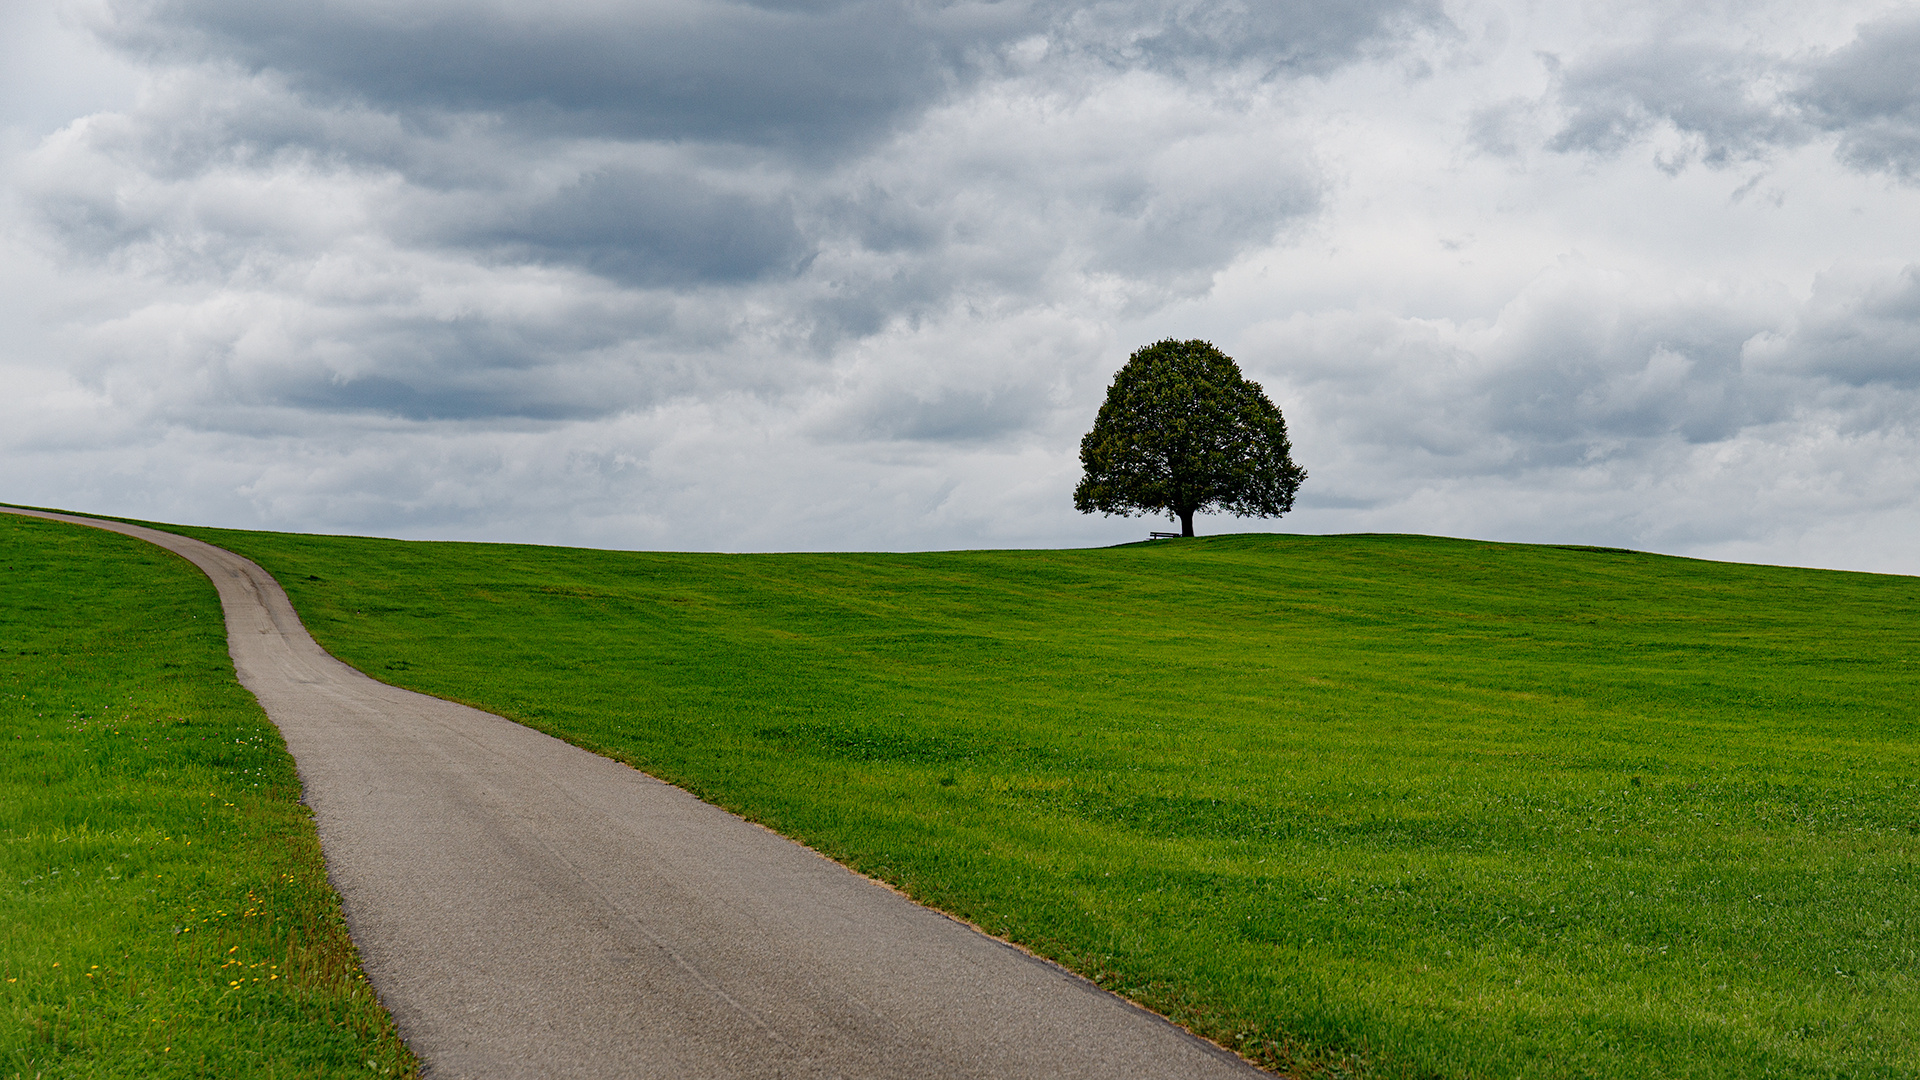 Der Weg zum Baum